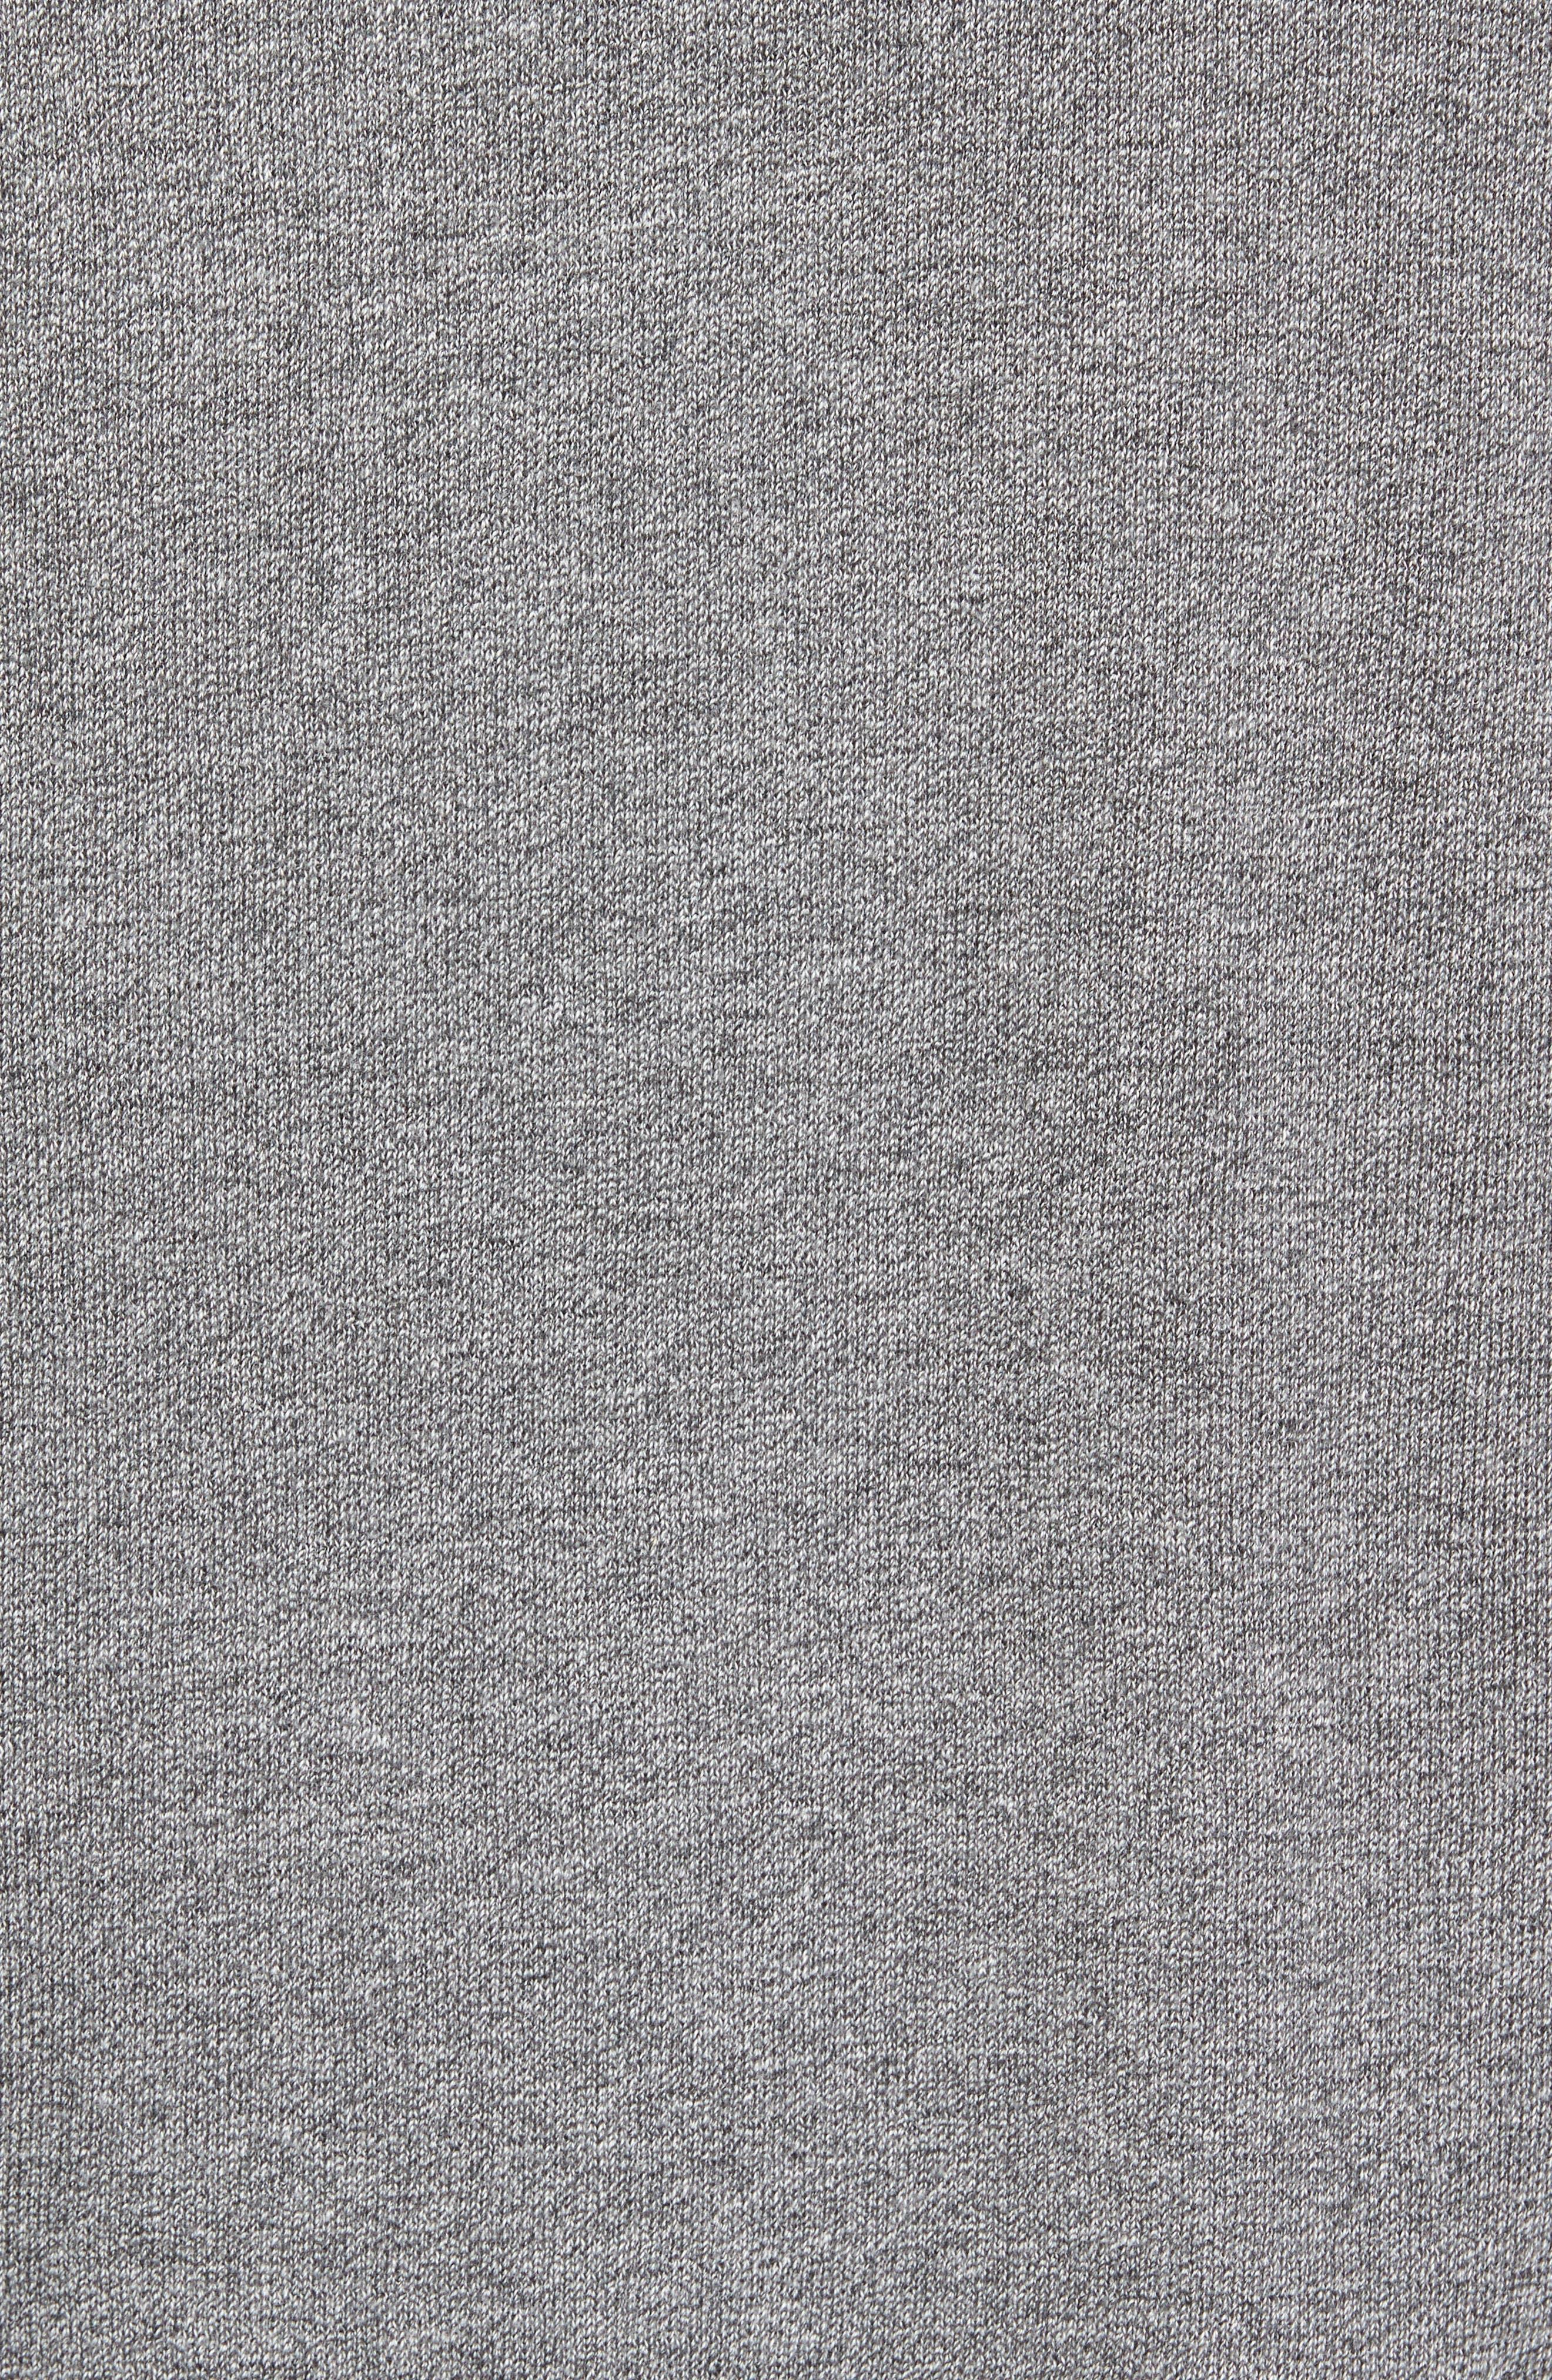 NFL Stitch of Liberty Embroidered Crewneck Sweatshirt,                             Alternate thumbnail 146, color,